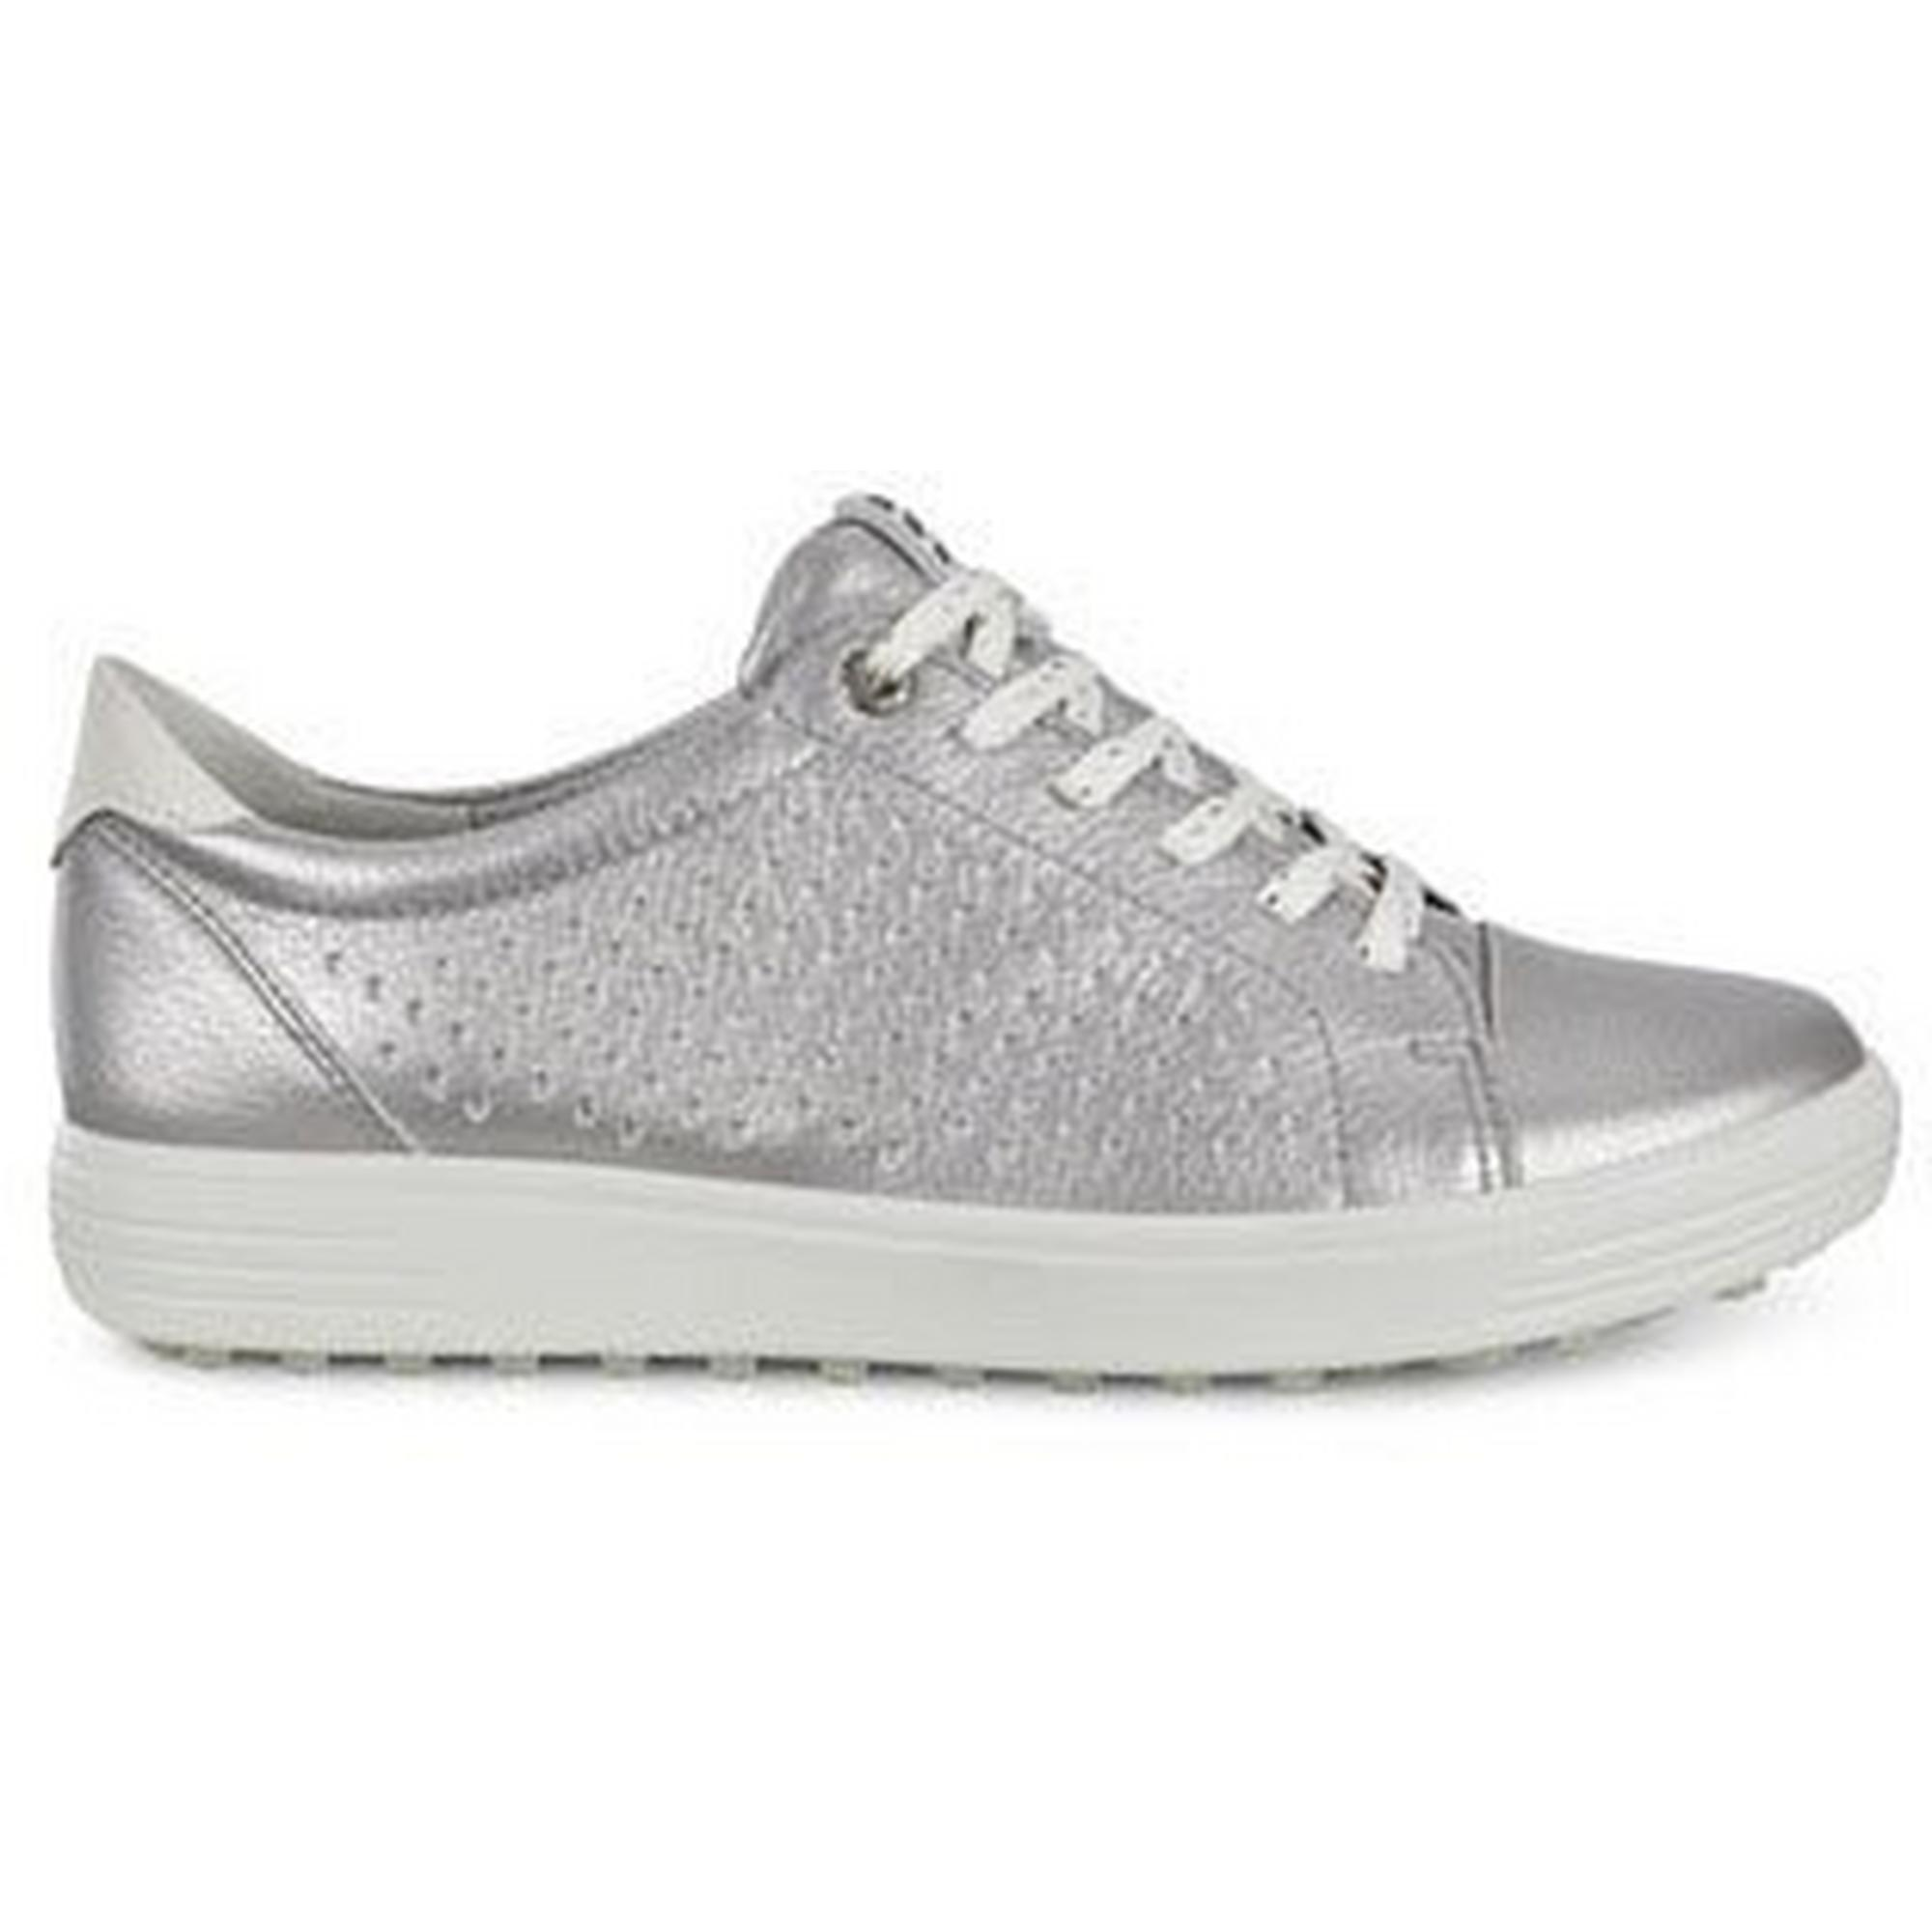 Women's Casual Hybrid Spikeless Golf Shoe - SIL/SIL